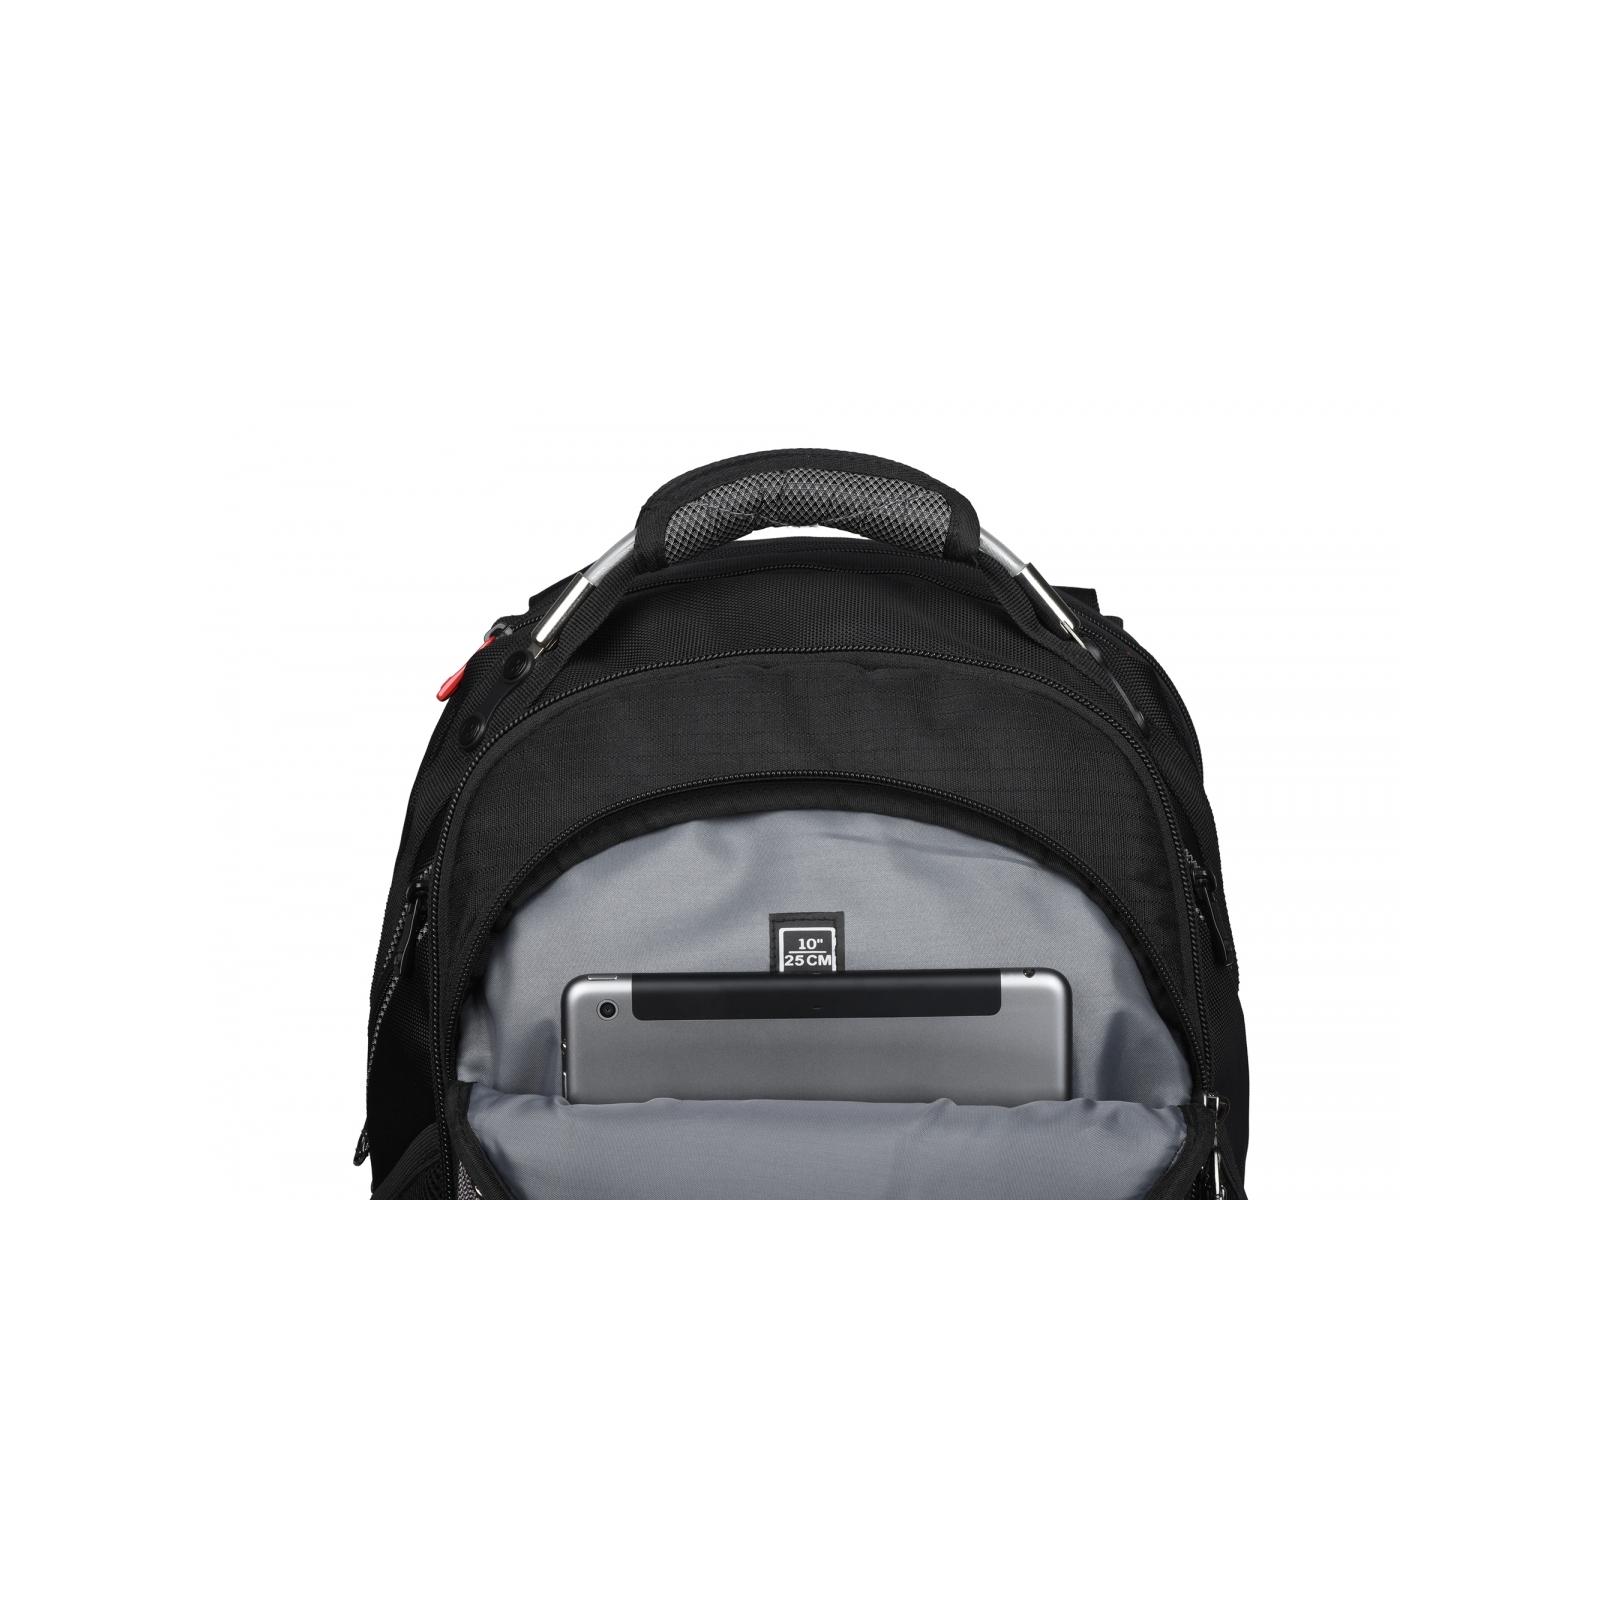 "Рюкзак для ноутбука Wenger 16"" Synergy Black/Gray (600635) изображение 7"